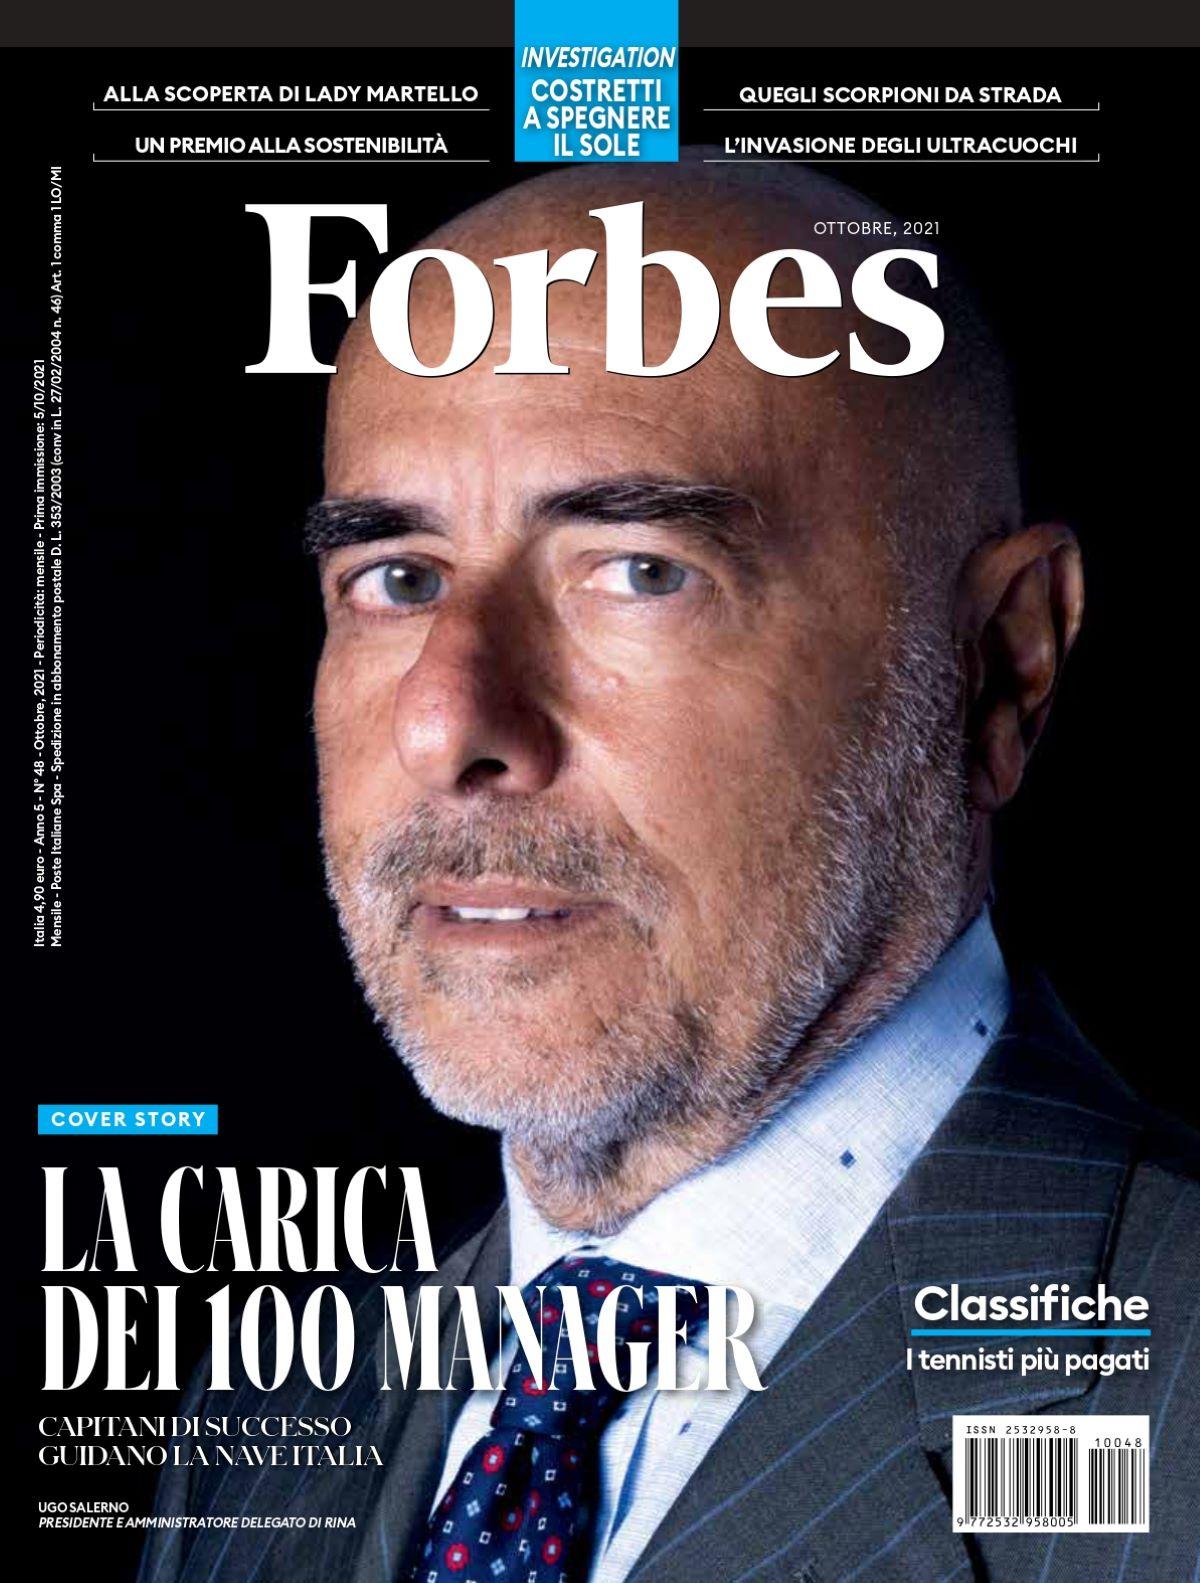 Copertina Forbes Gianfranco Scalabrini ClubDealOnline